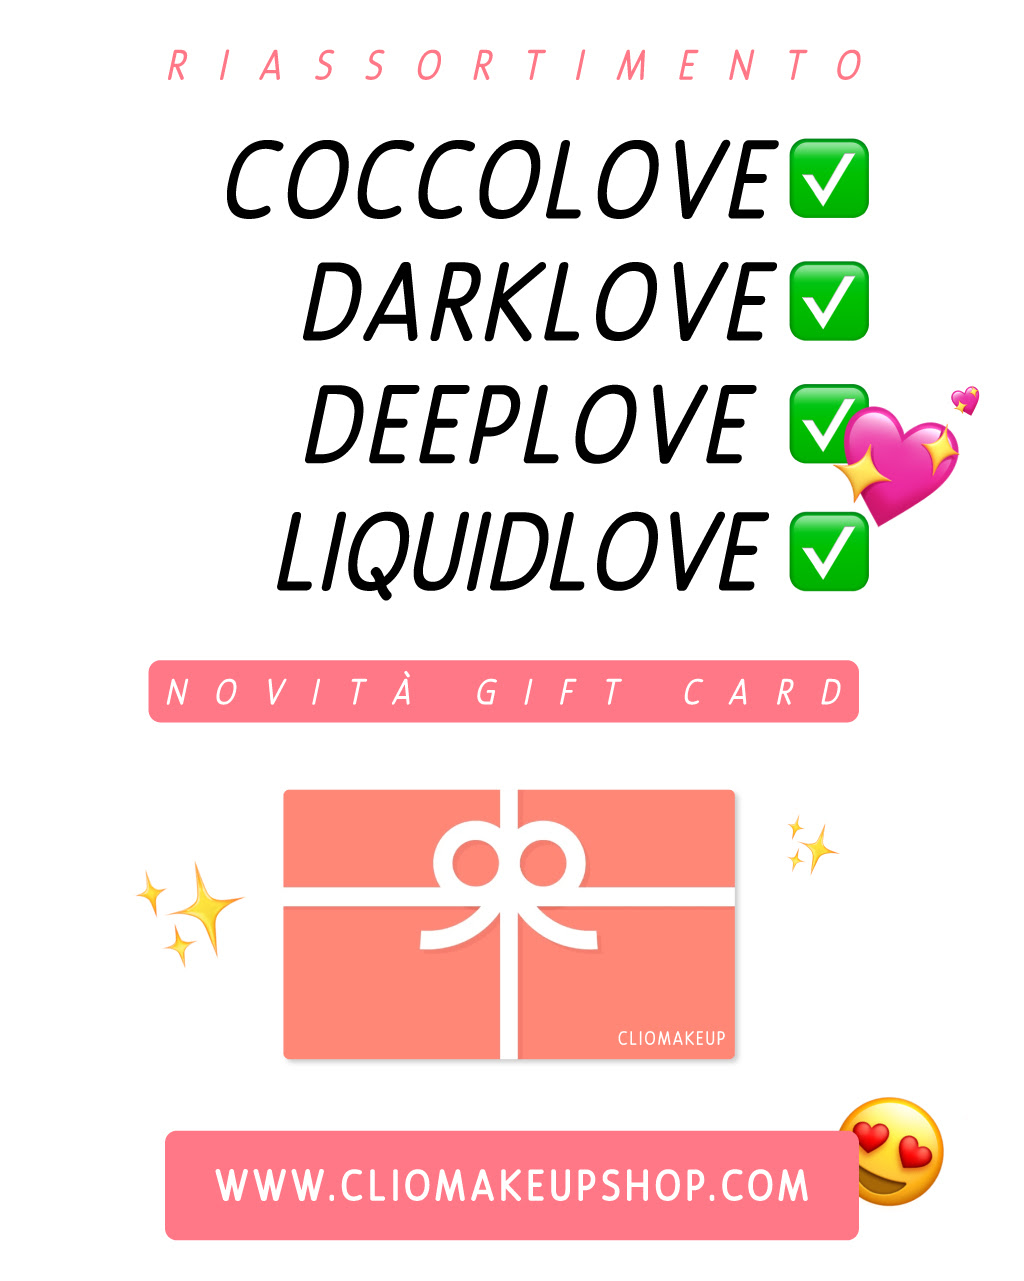 restock coccolove darklove deeplove liquidlove